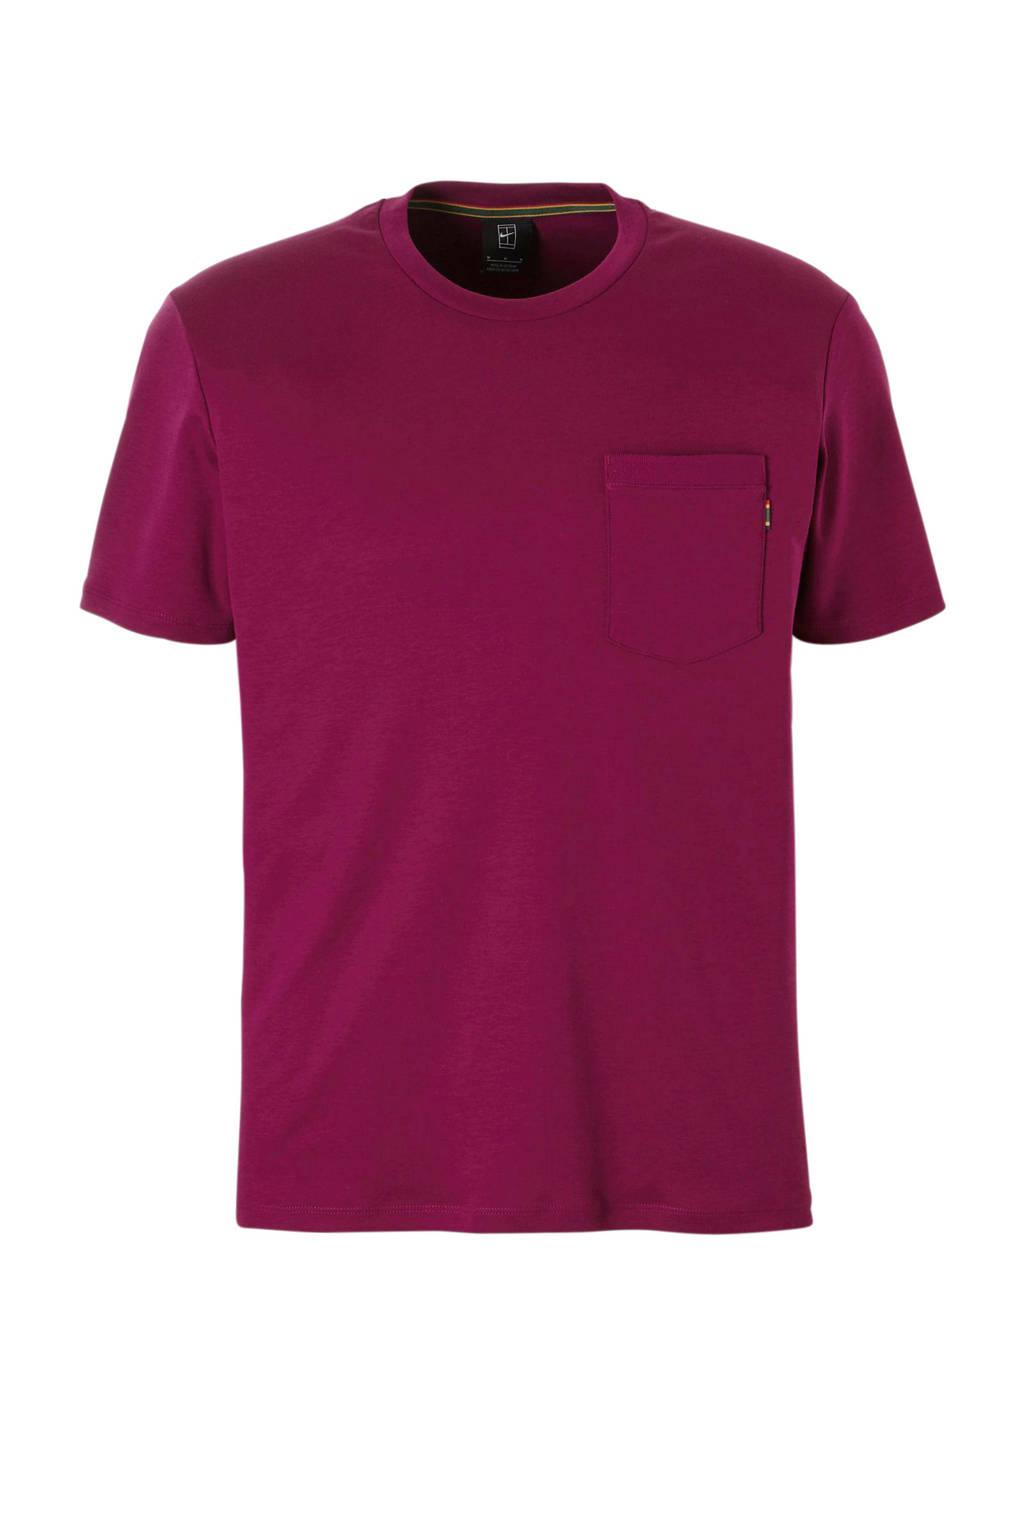 Nike   sport T-shirt, Paars